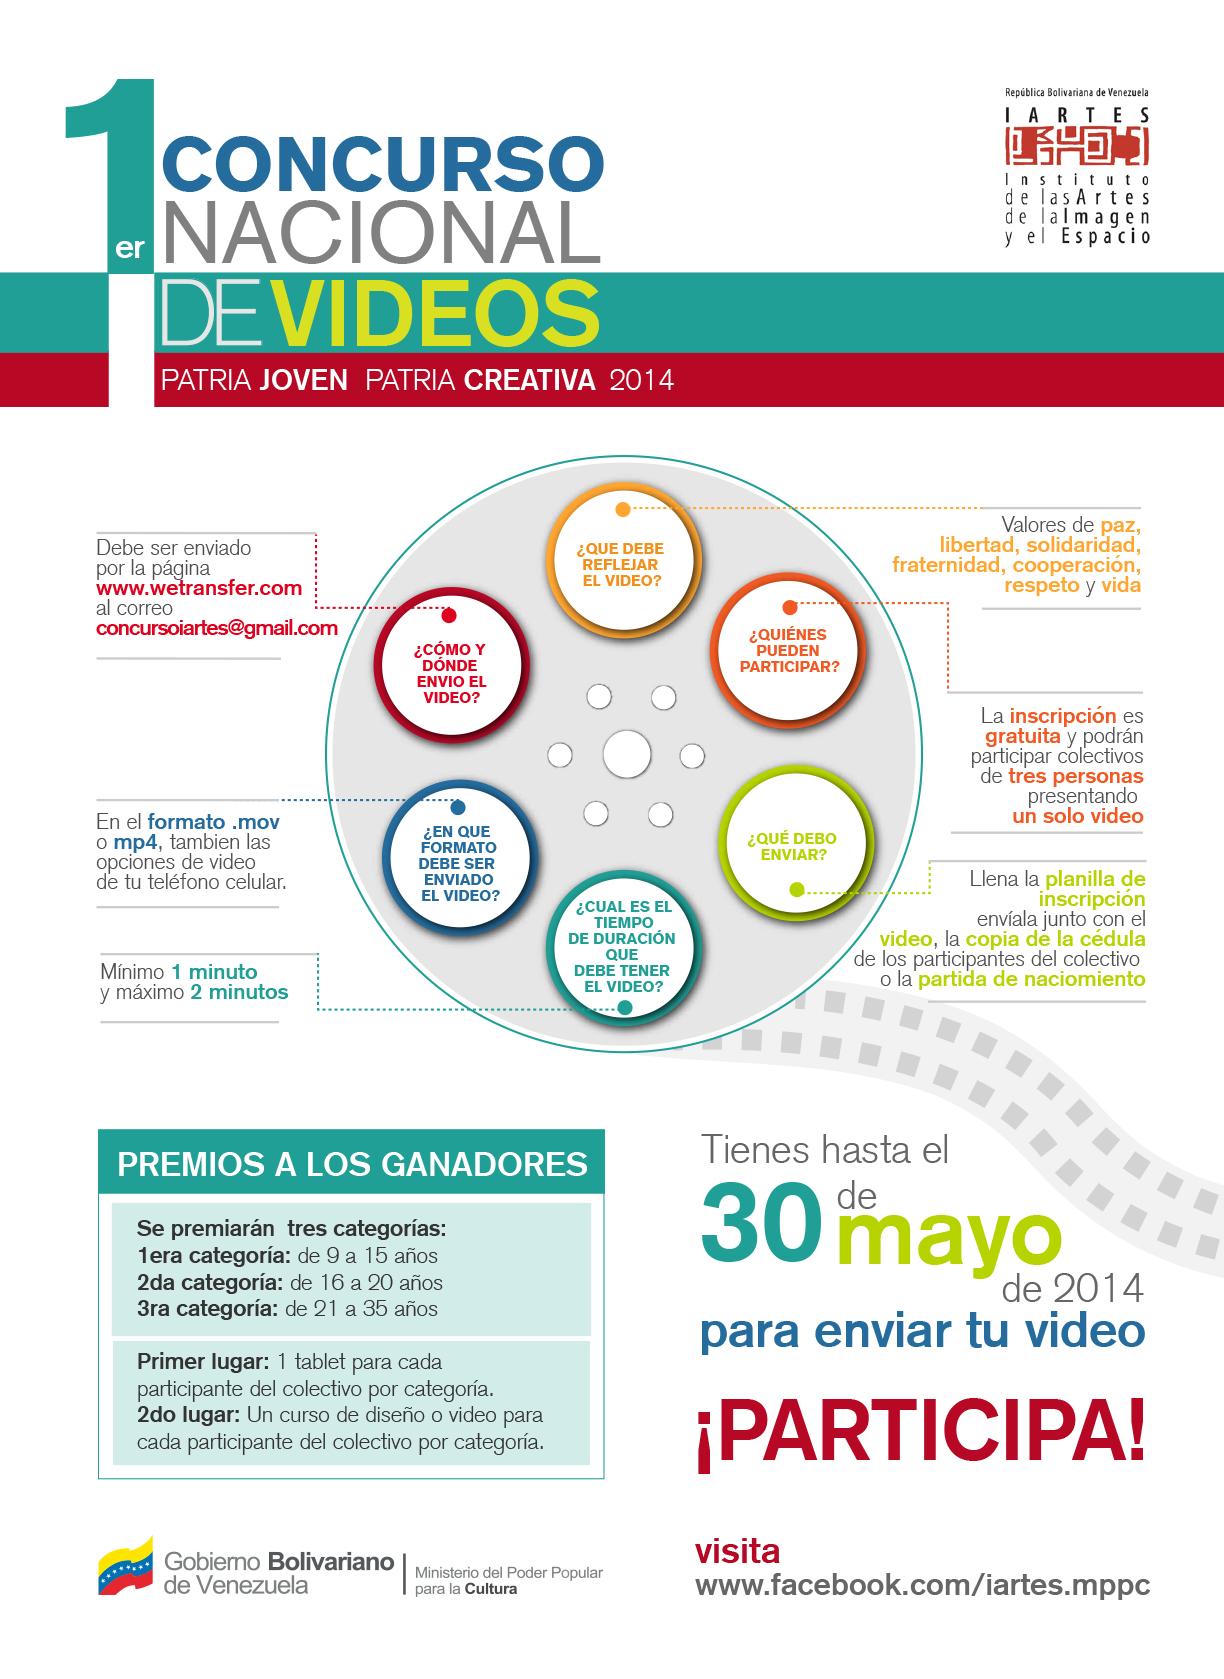 1er Concurso Nacional de Video IARTES - Patria Joven, Patria Creativa